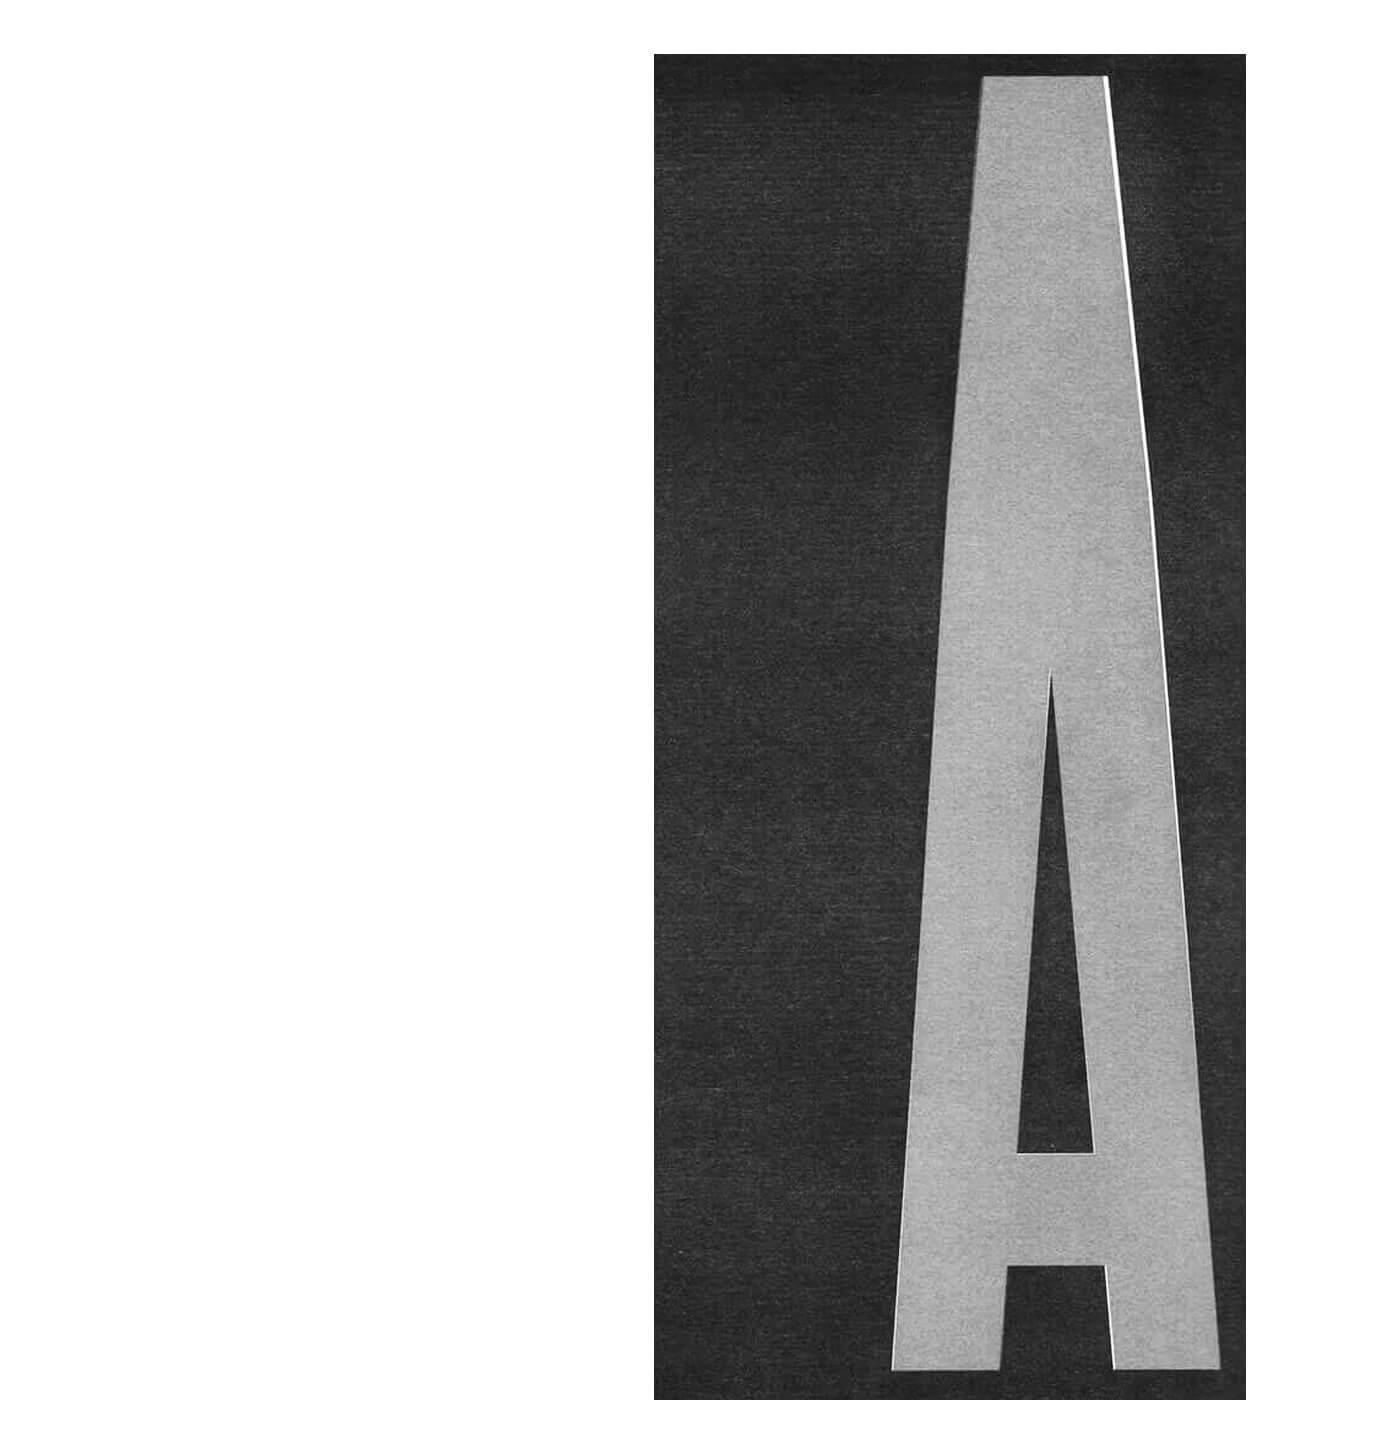 AB_4-095